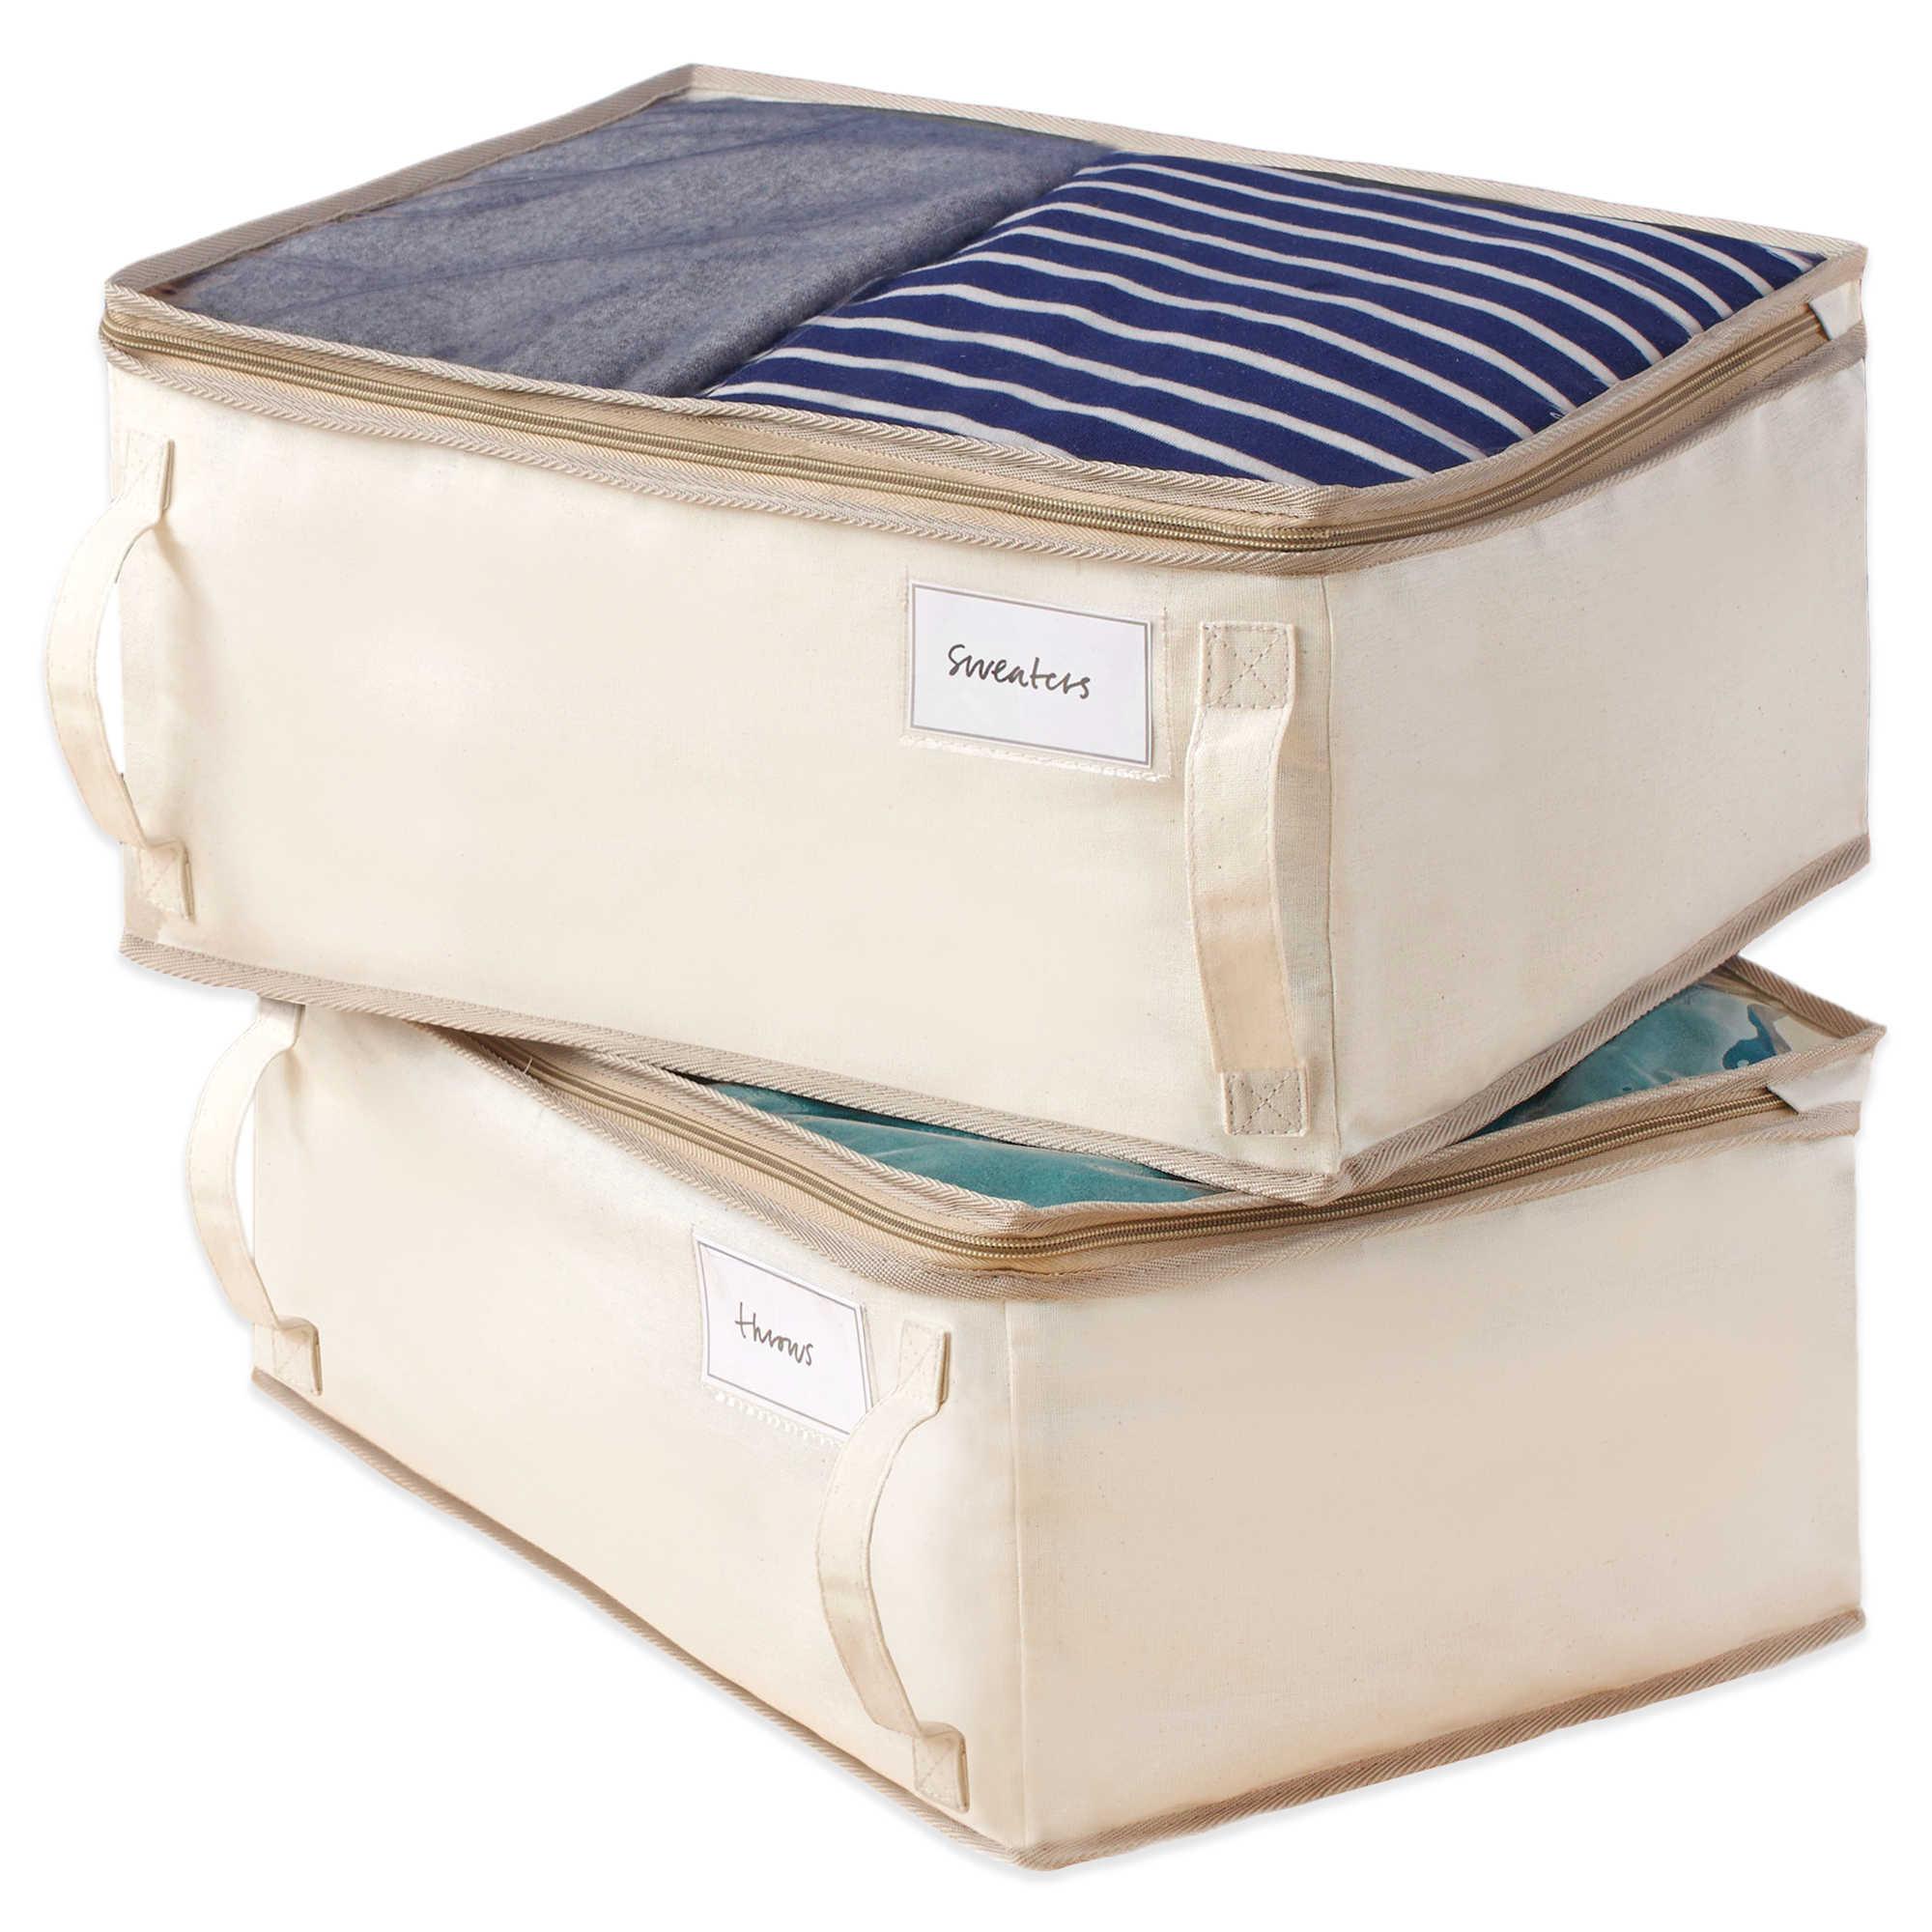 Garment storage bags